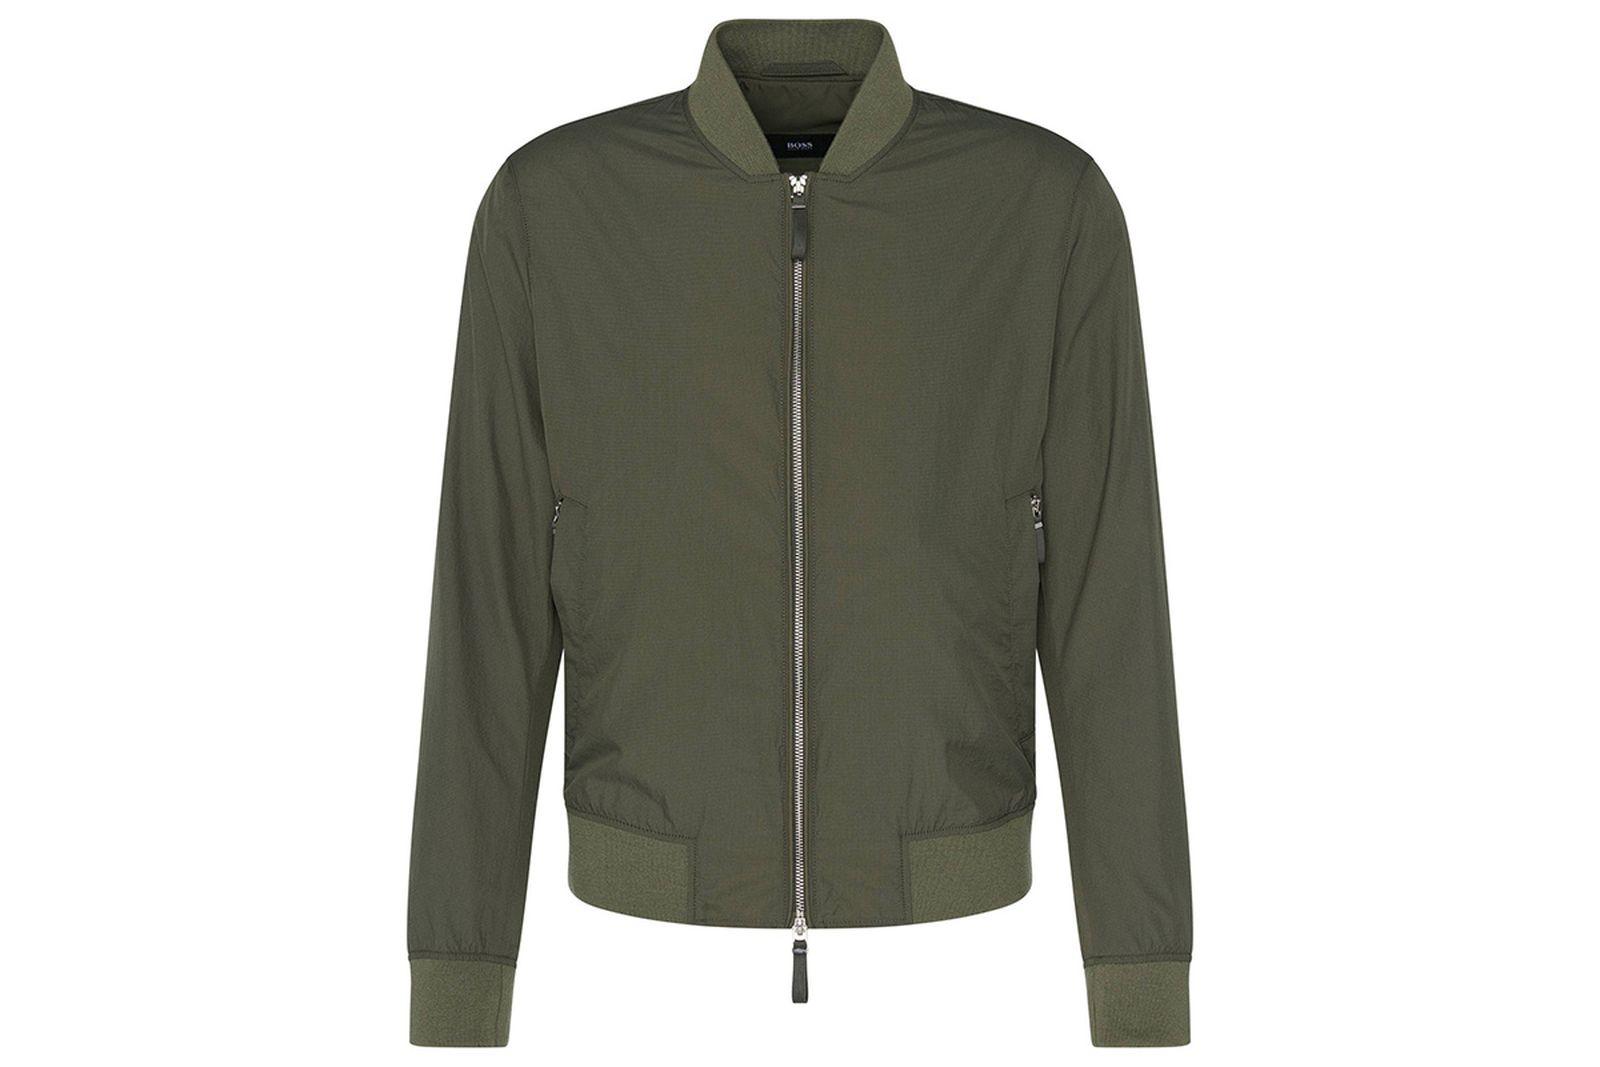 Men's Spring Jackets